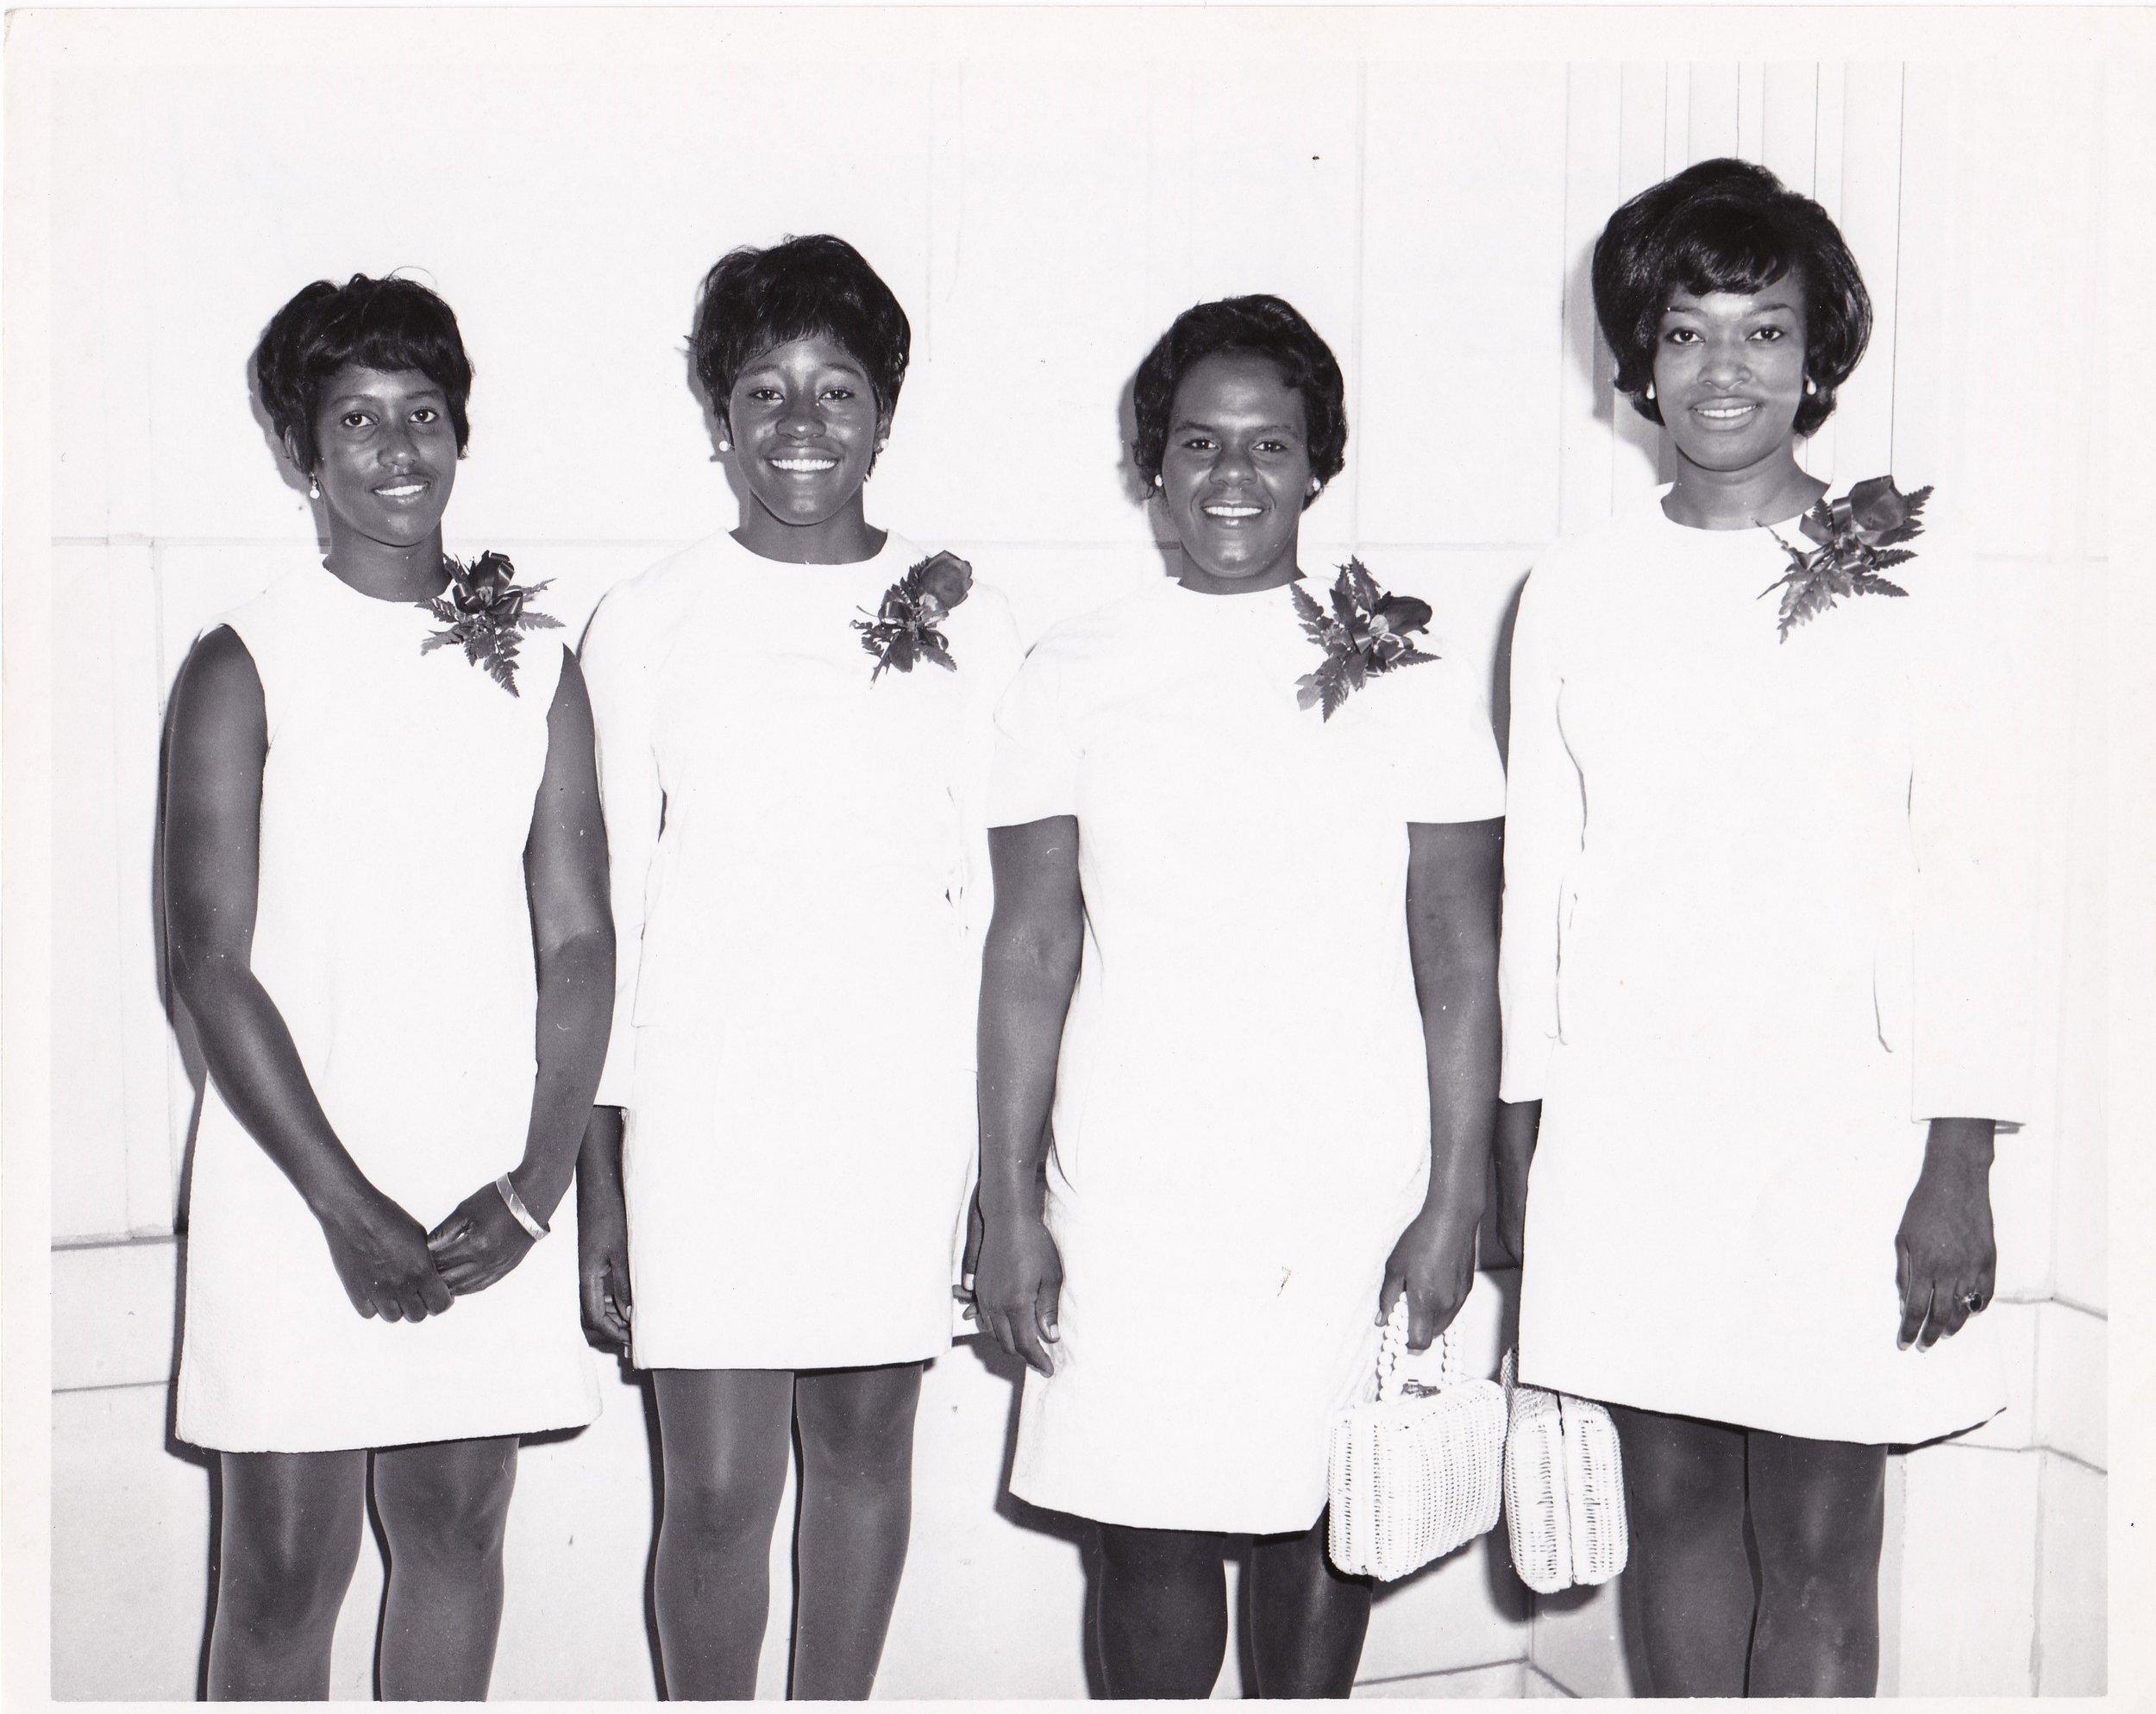 '70 Brenda Wilson, Connie Payton, Marilyn Joseph, Deloris Barrow